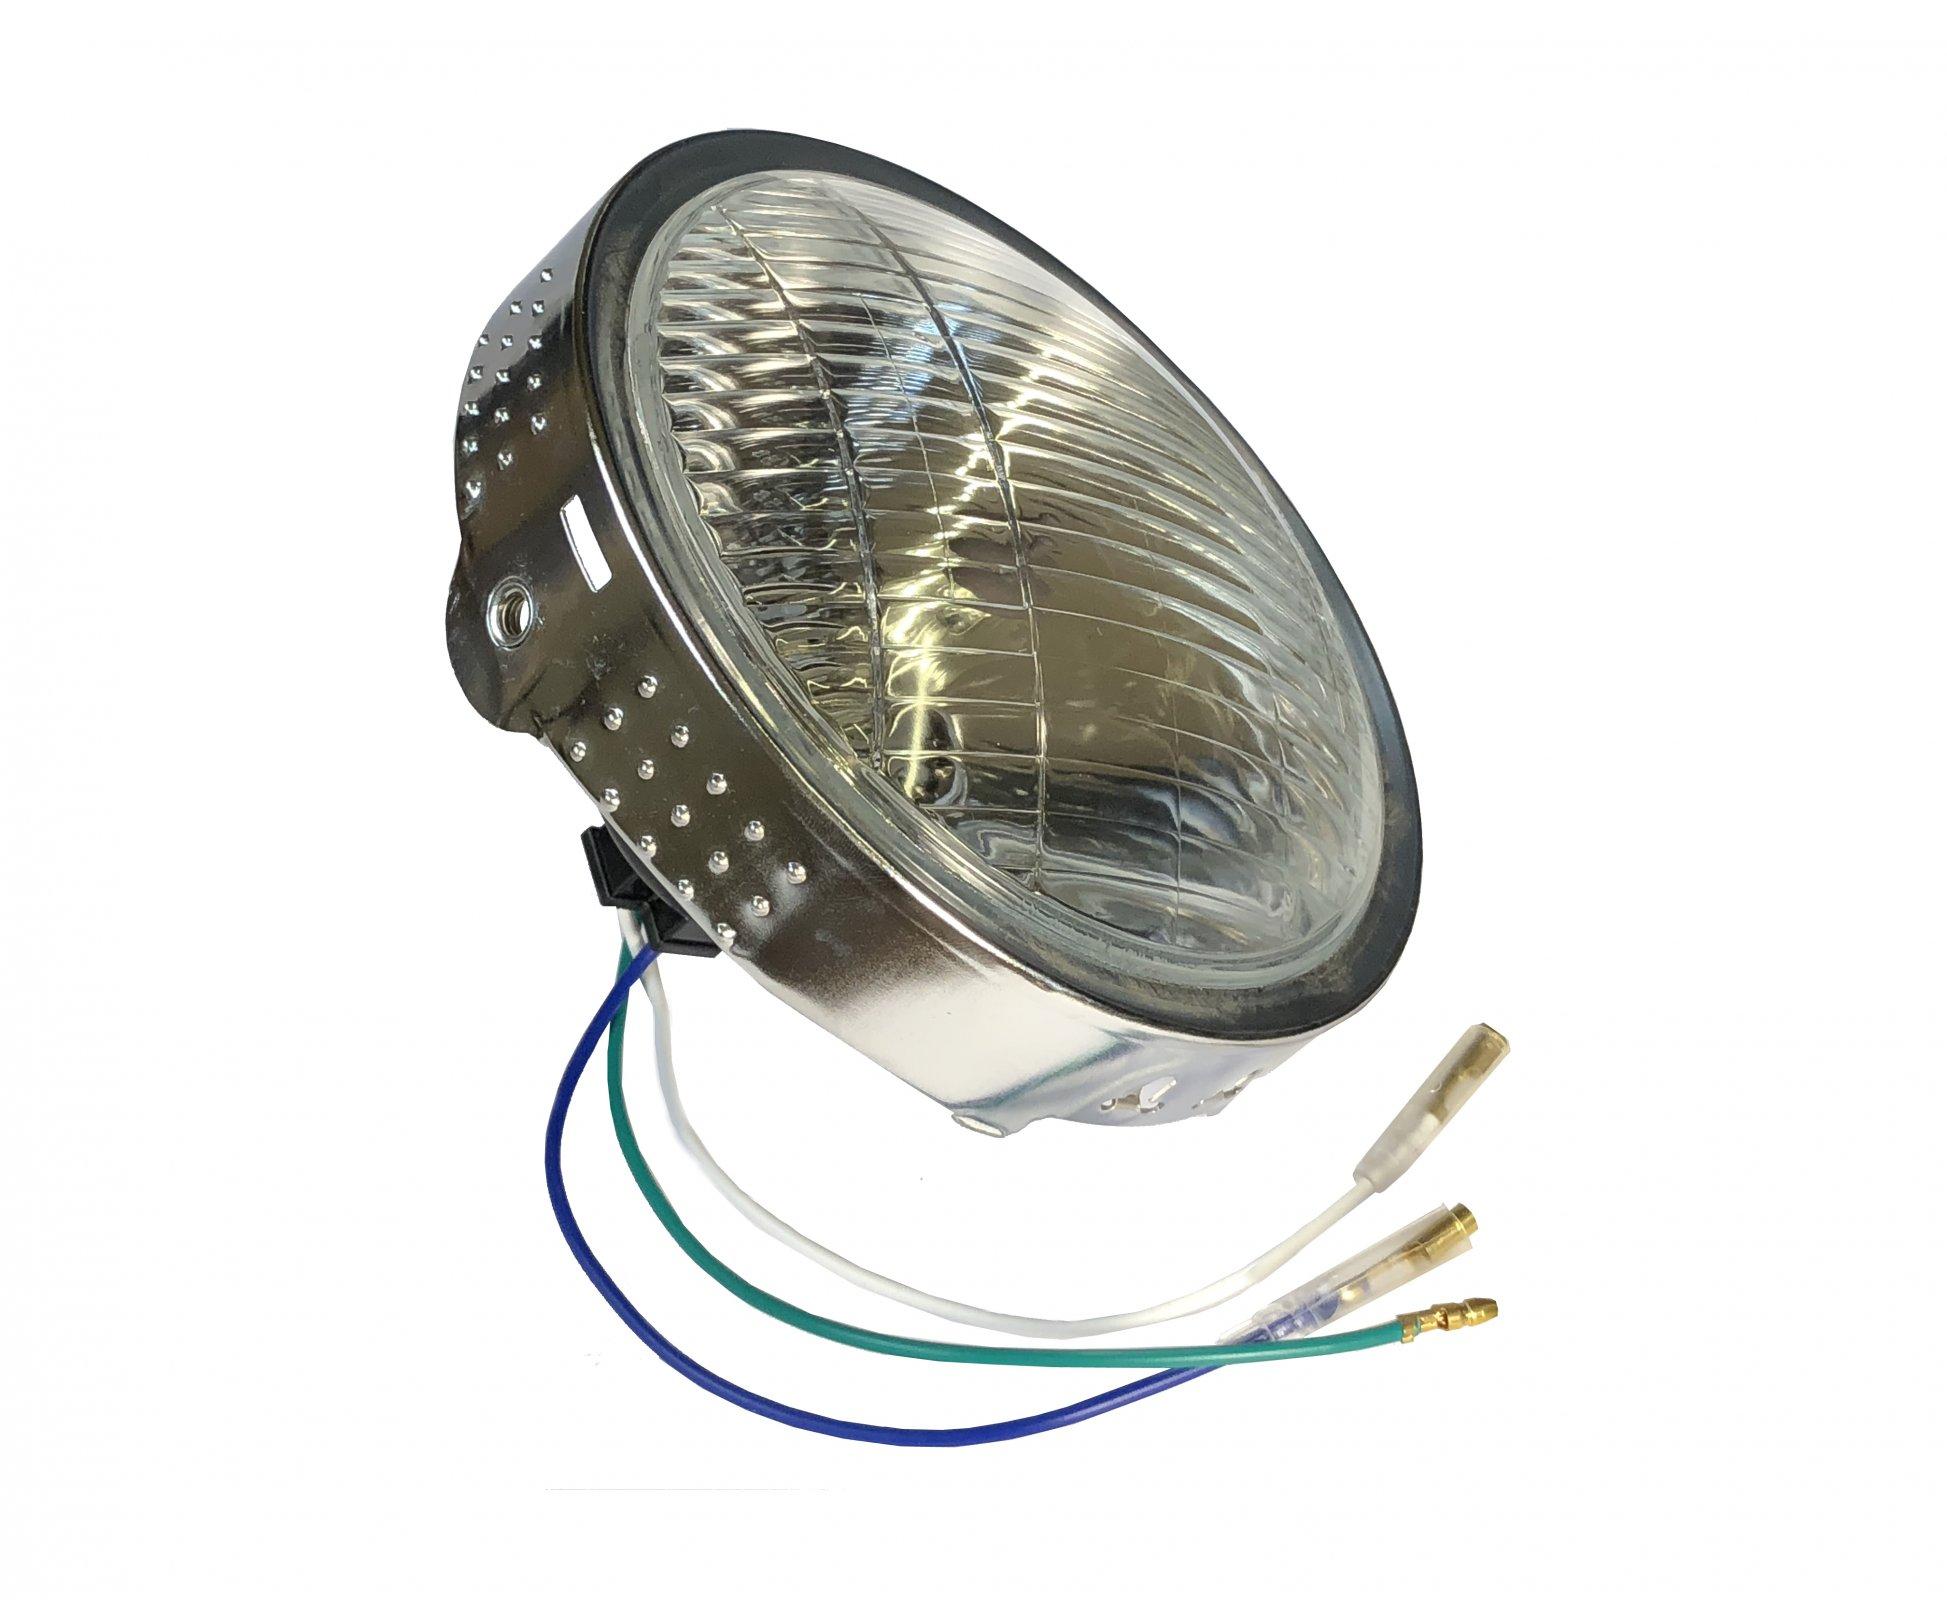 Headlights Supplies Yamaha 250 Enduro Wiring Harness Xt500 Dt80 Dt100 Dt125 Dt175 Dt250 Dt400 Headlight Lamp Kit H4 Up Grade 26 023